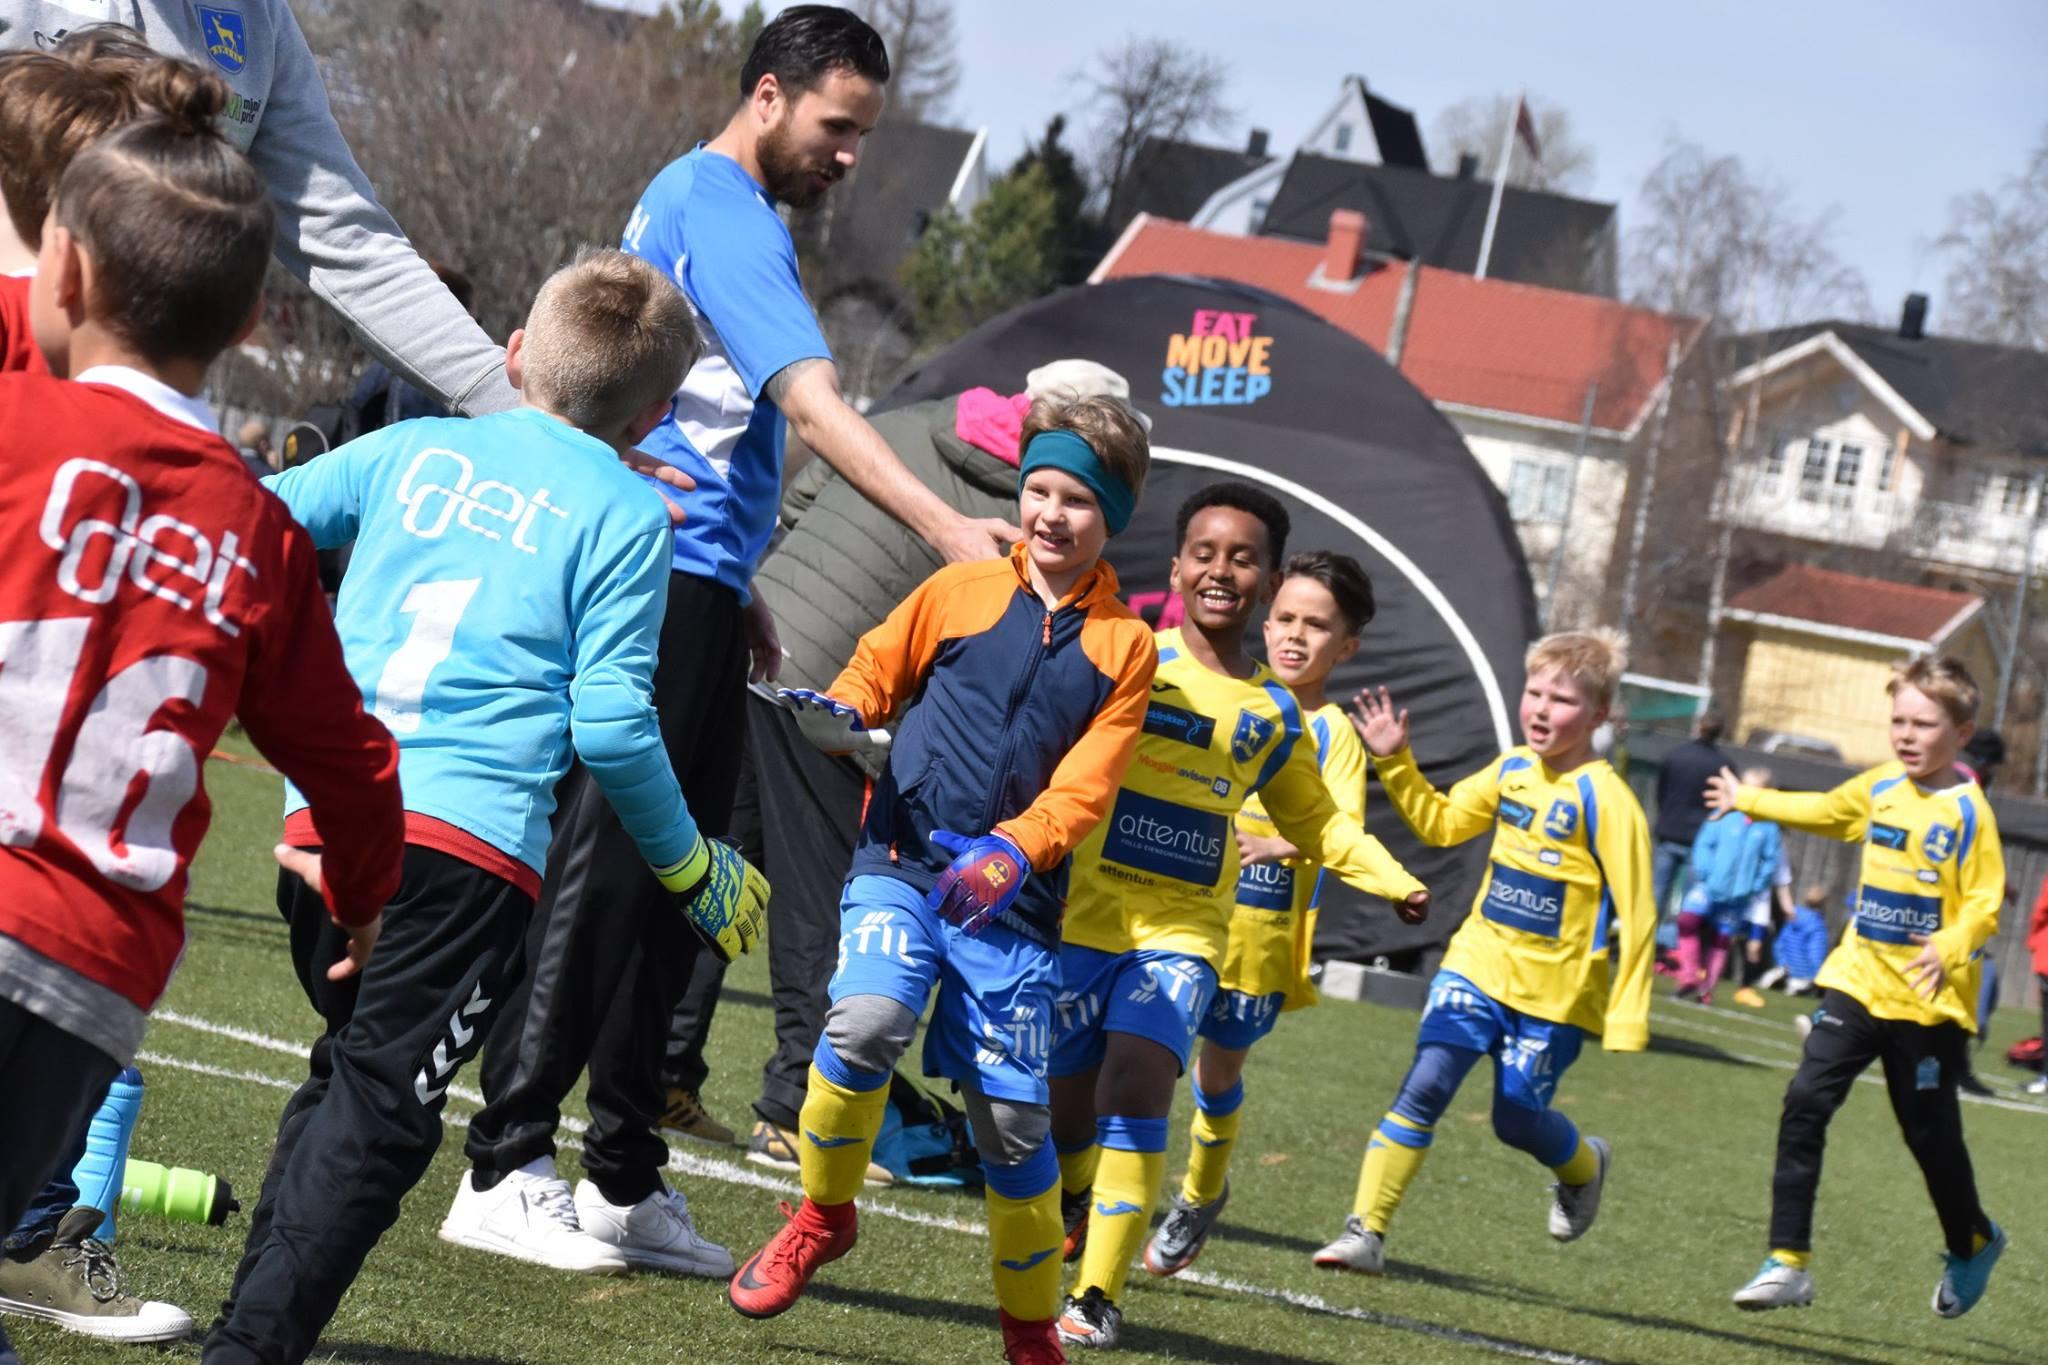 c4b85b8b Påmeldte lag - EAT MOVE SLEEP CUP SKI 2019 Results